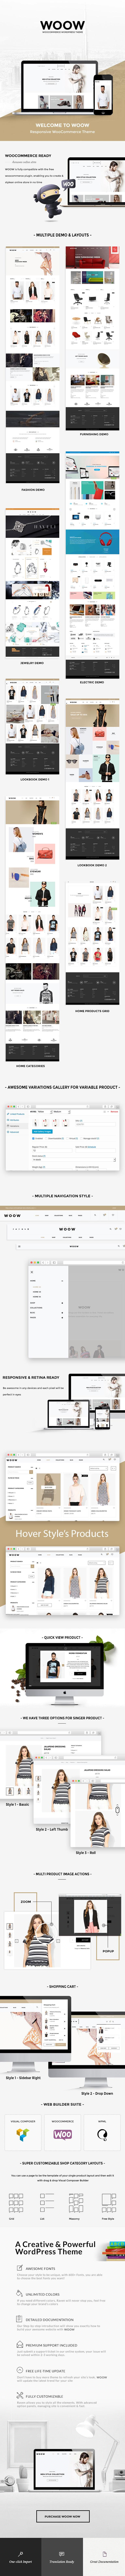 WOOW - Fashion WooCommerce WordPress theme